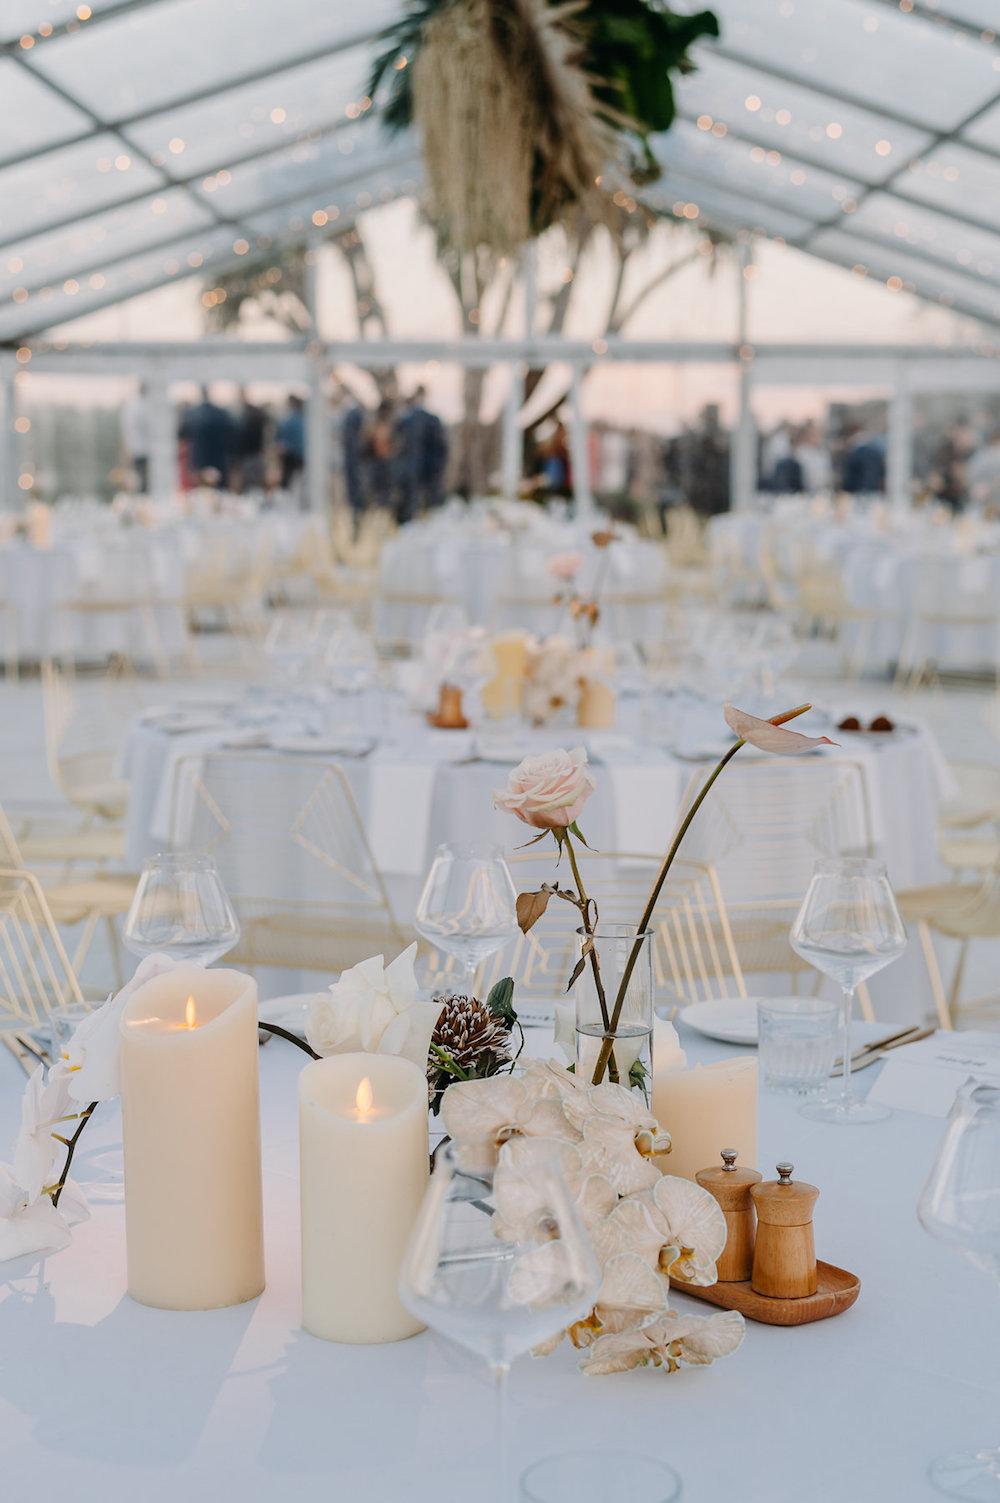 Olivia+Matt+Elements+Byron+Bay+Wedding+Hampton+Event+Hire9.jpg